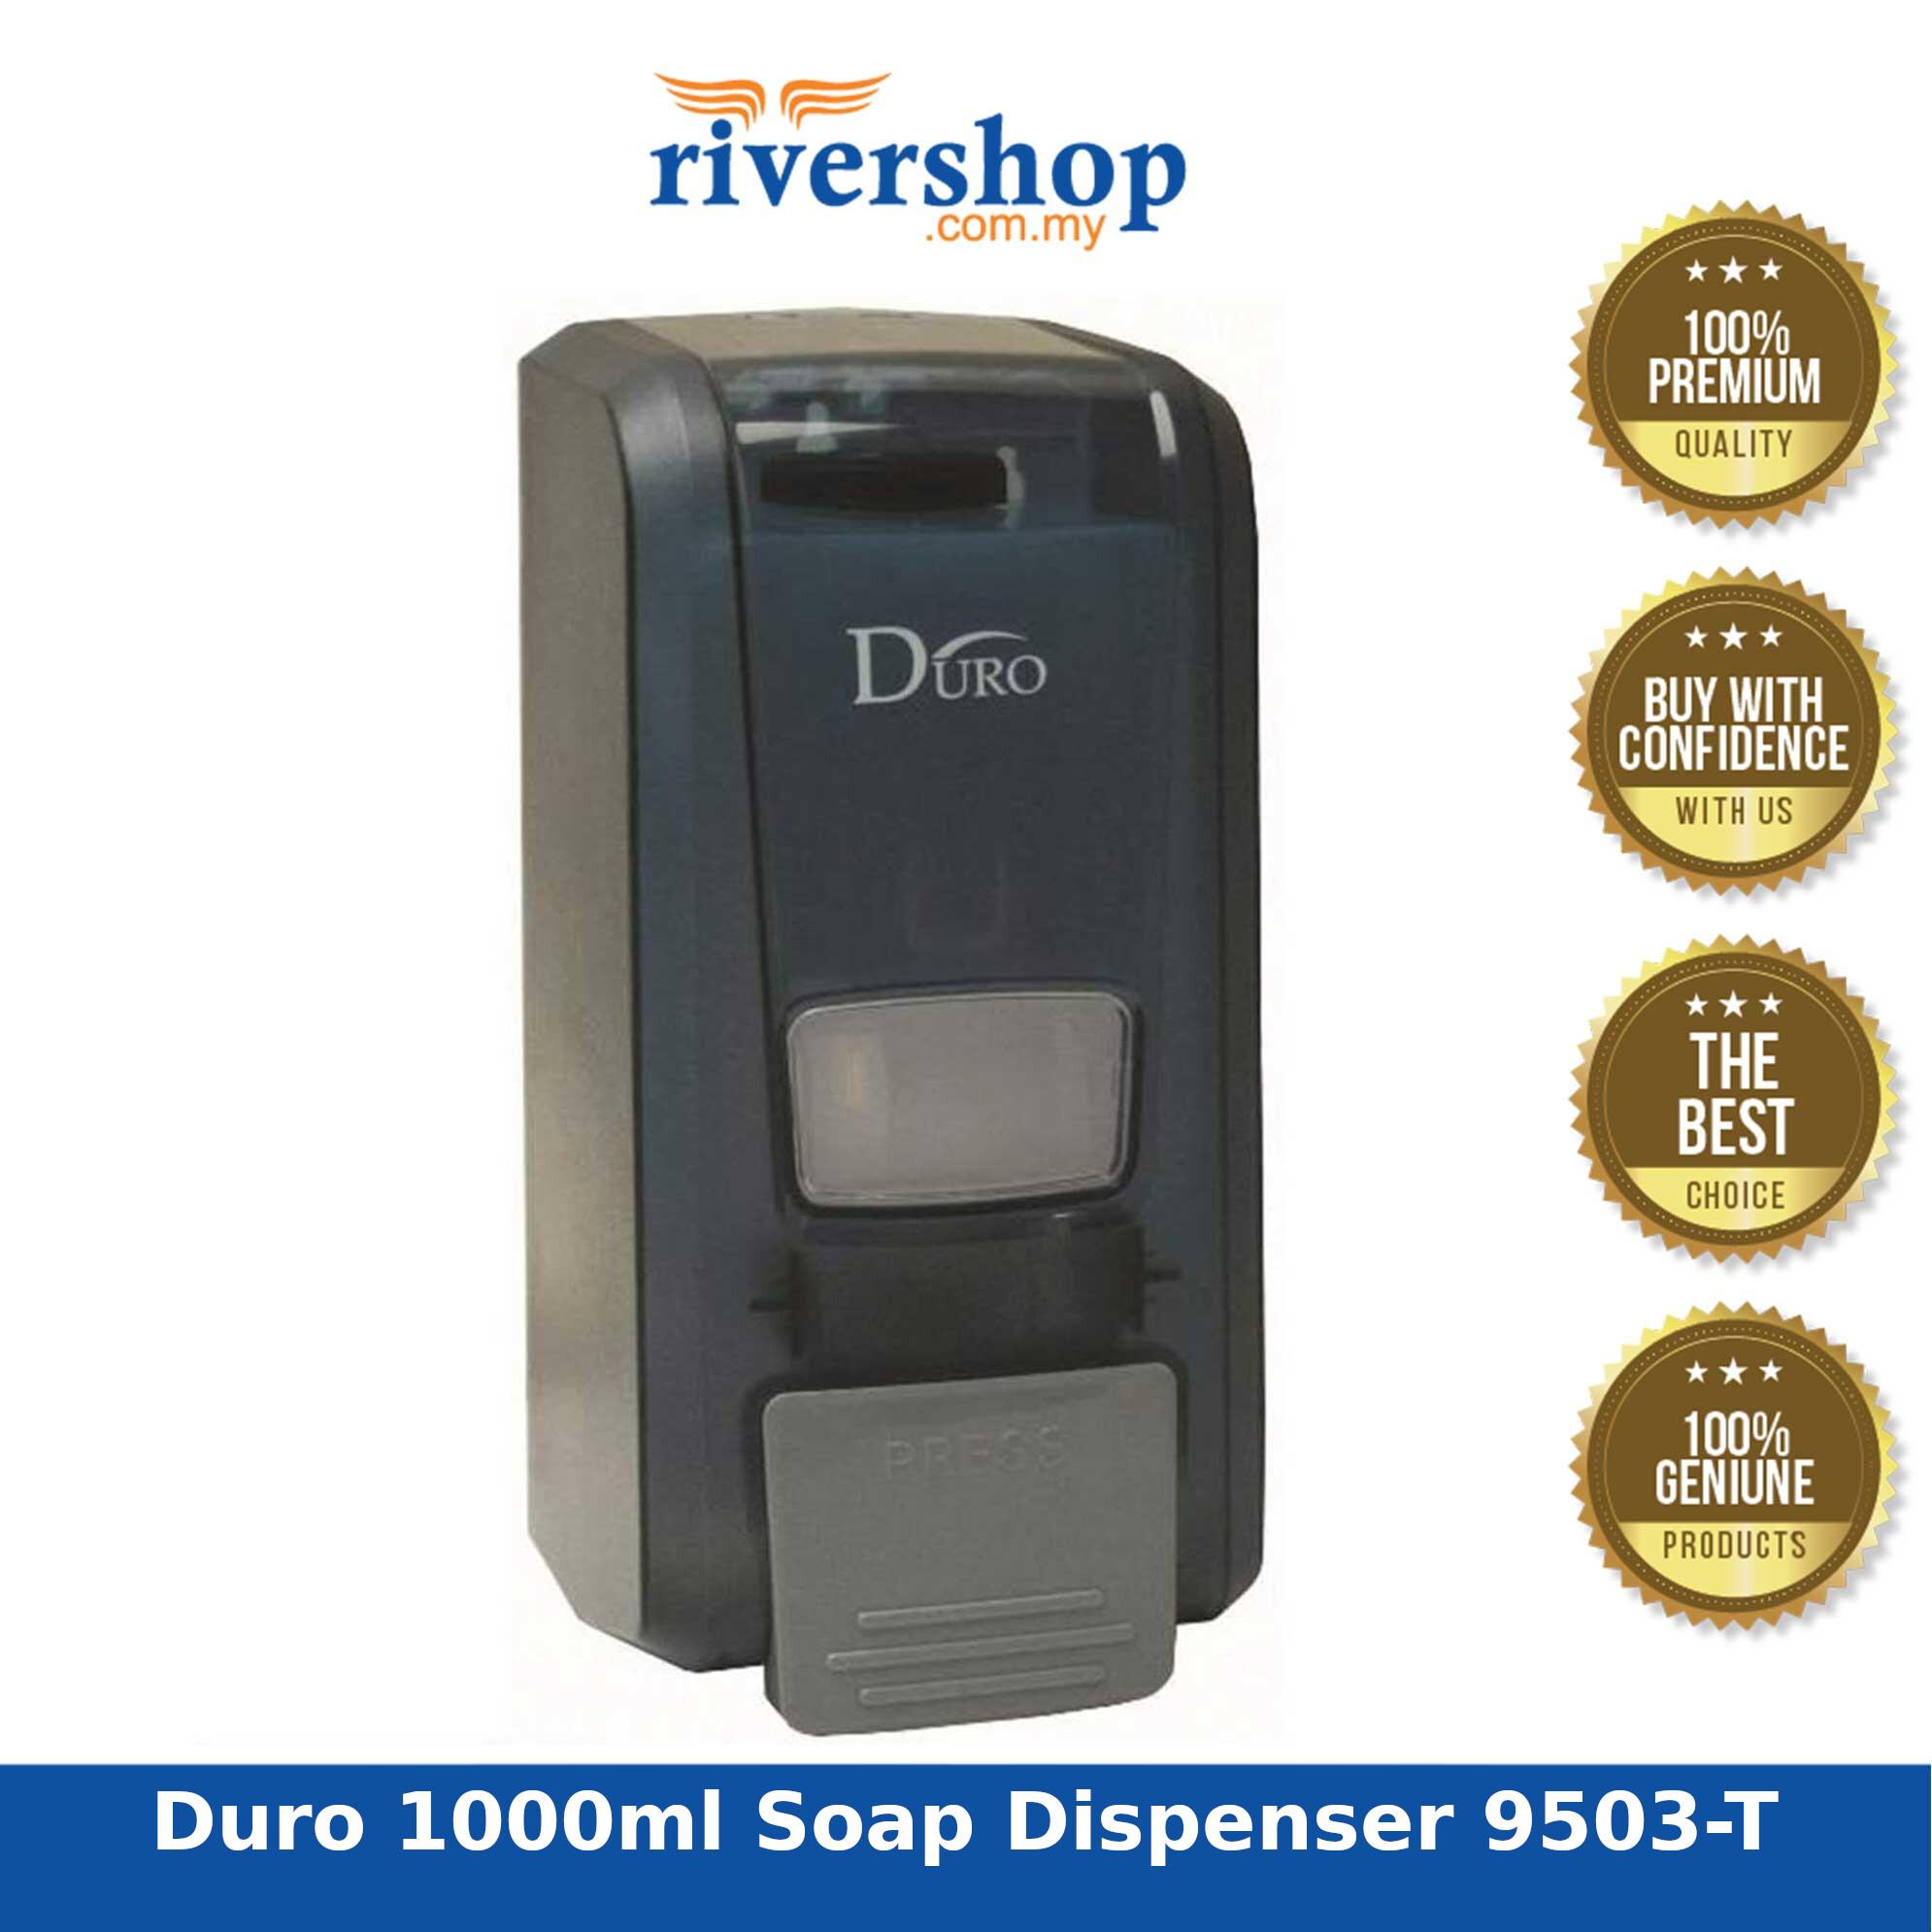 [Ready Stock] DURO 1000ml Soap Dispenser 9503-T